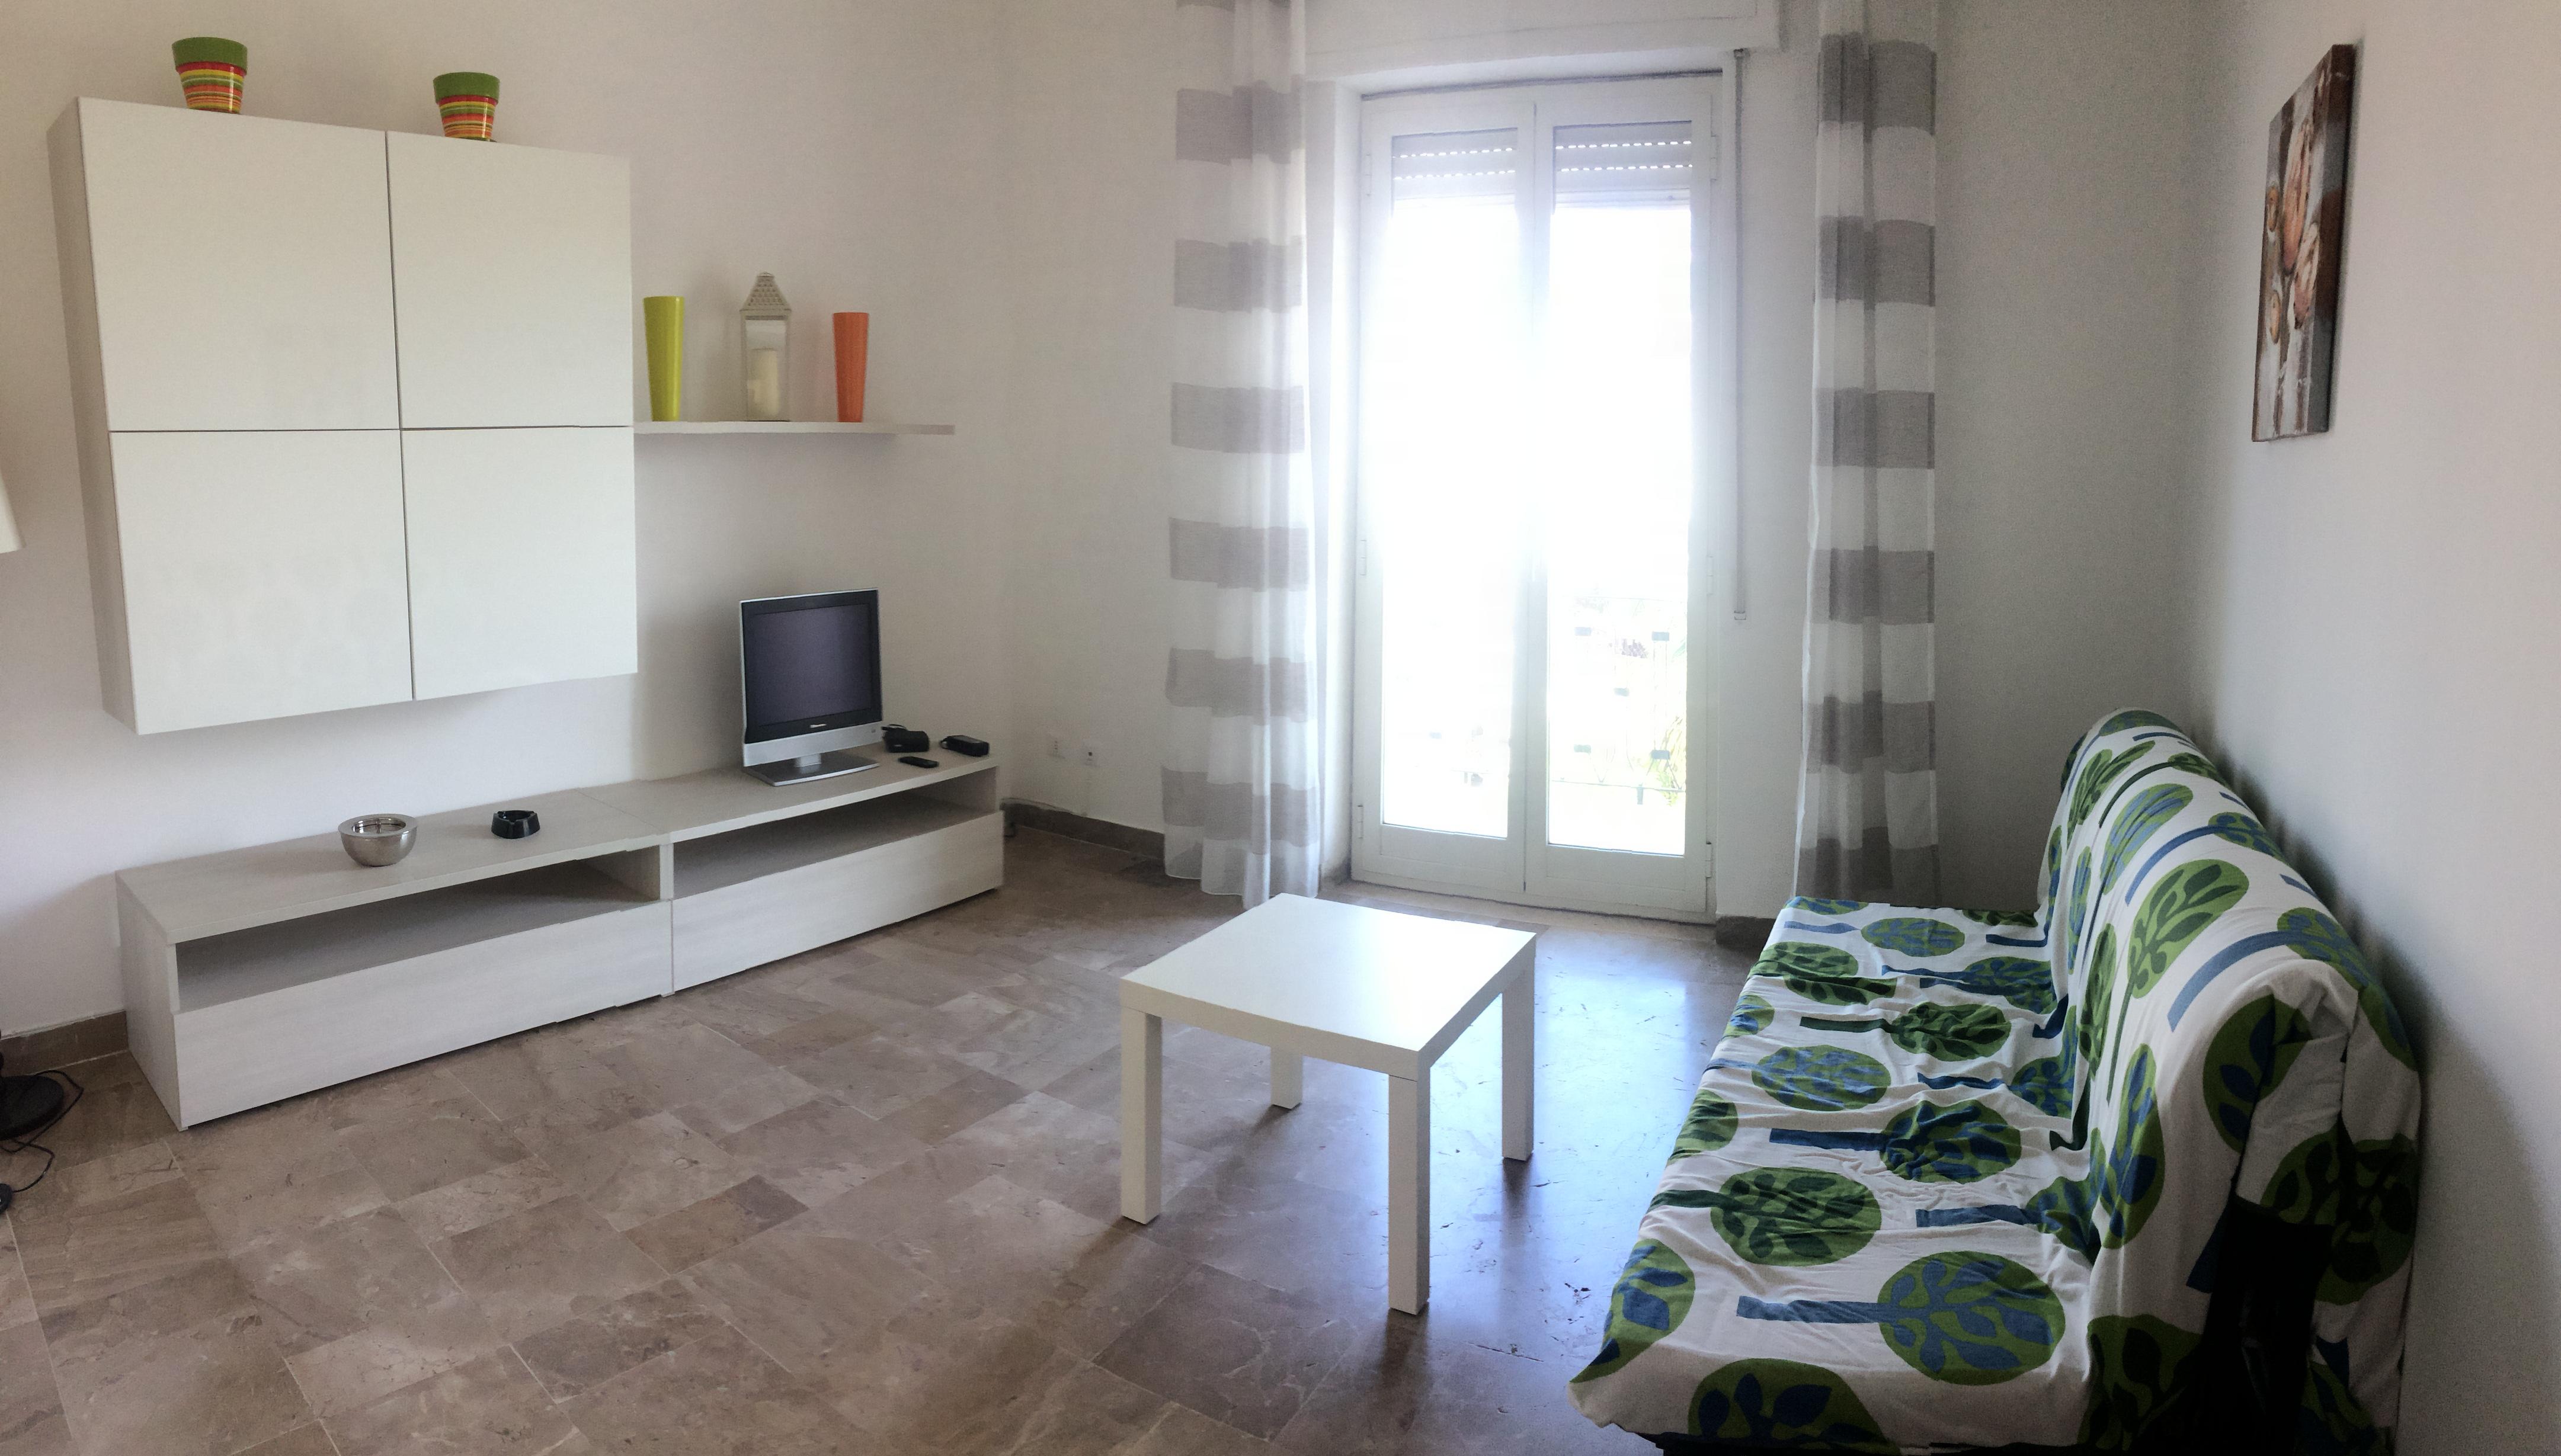 Appartamento al piano secondo